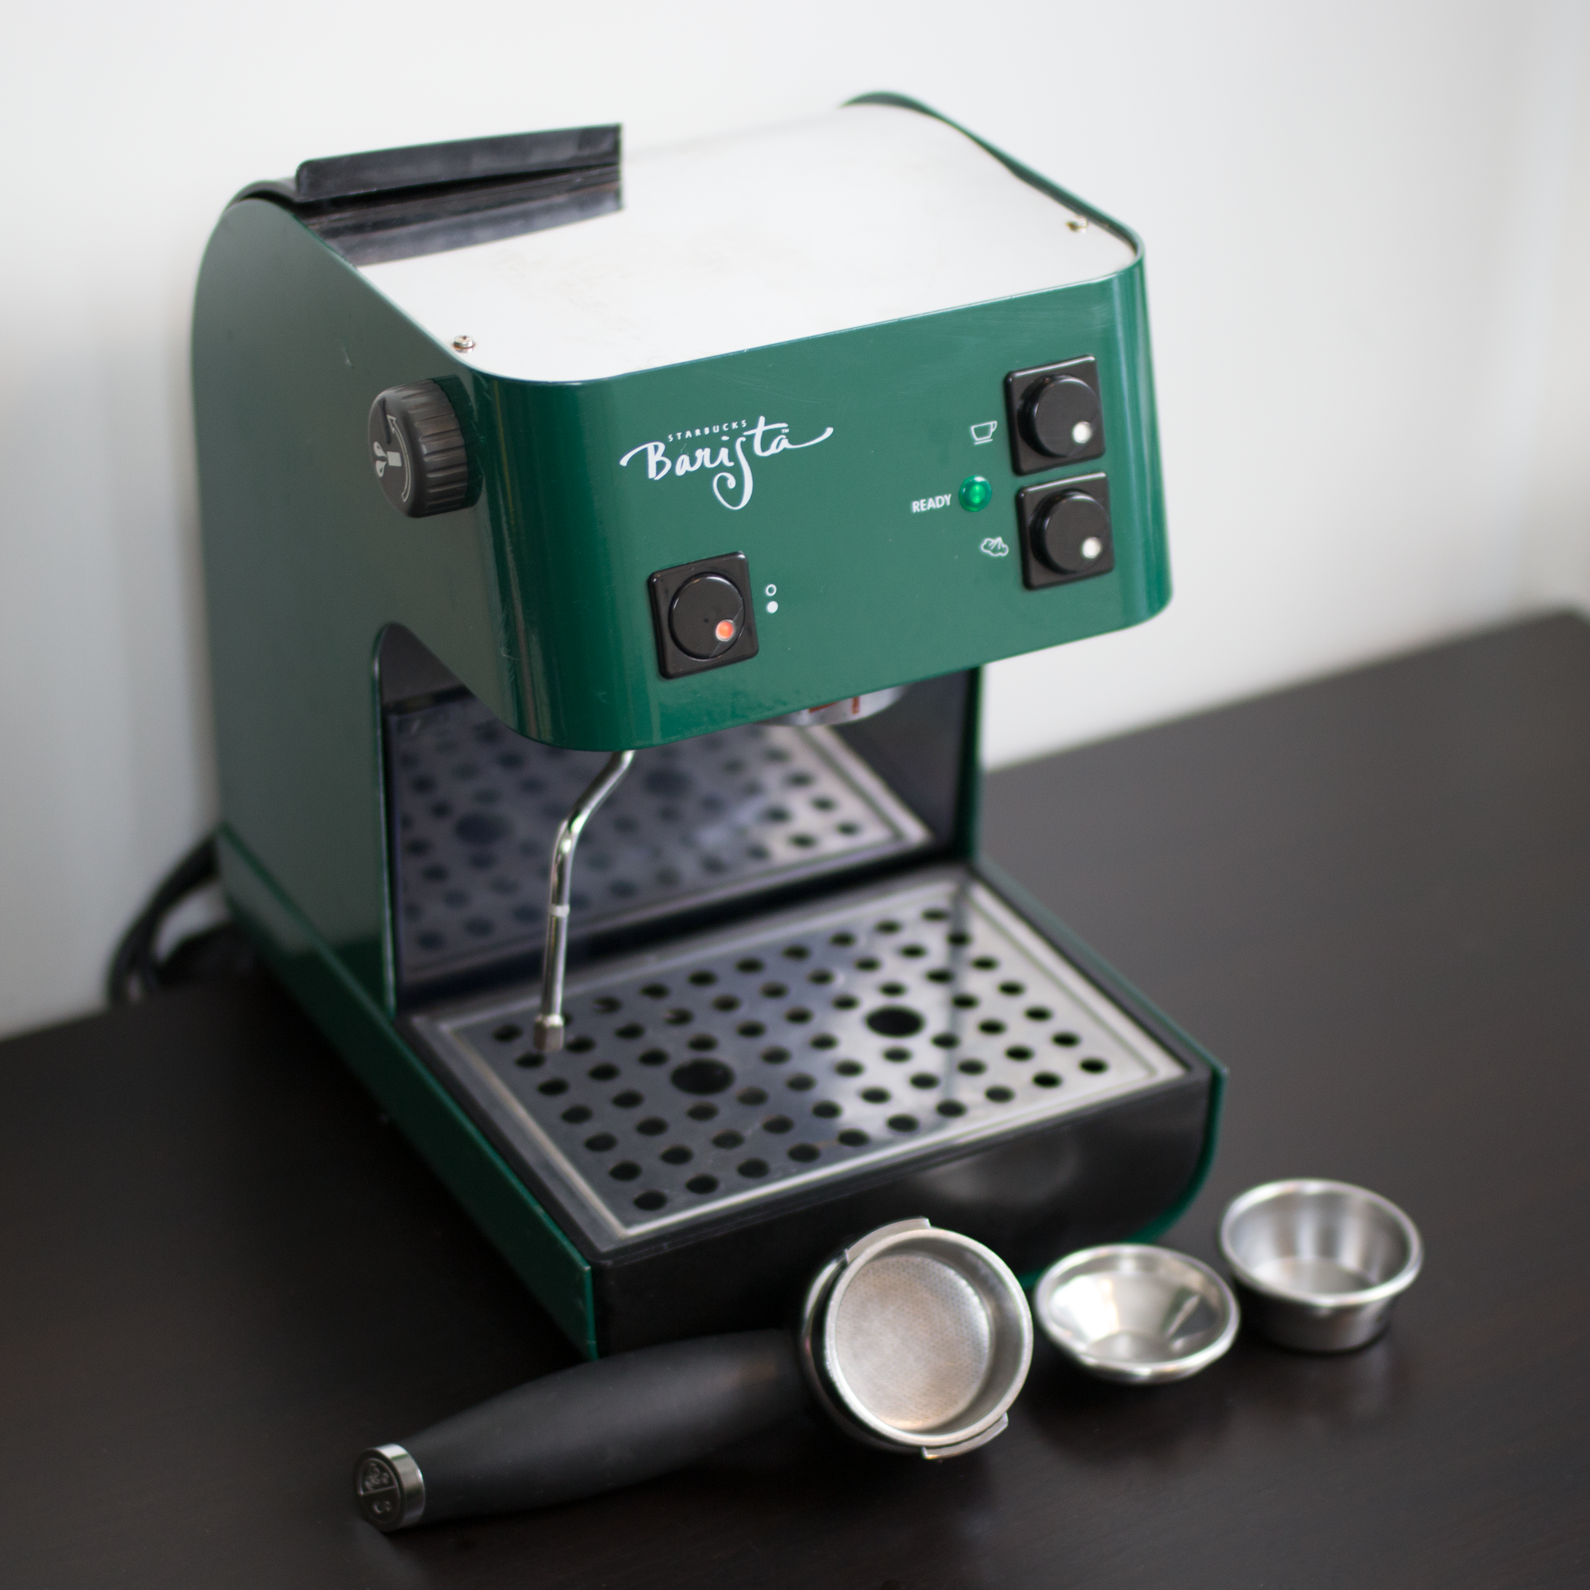 Details about Keurig Rivo R500 LaVazza Espresso Cappuccino